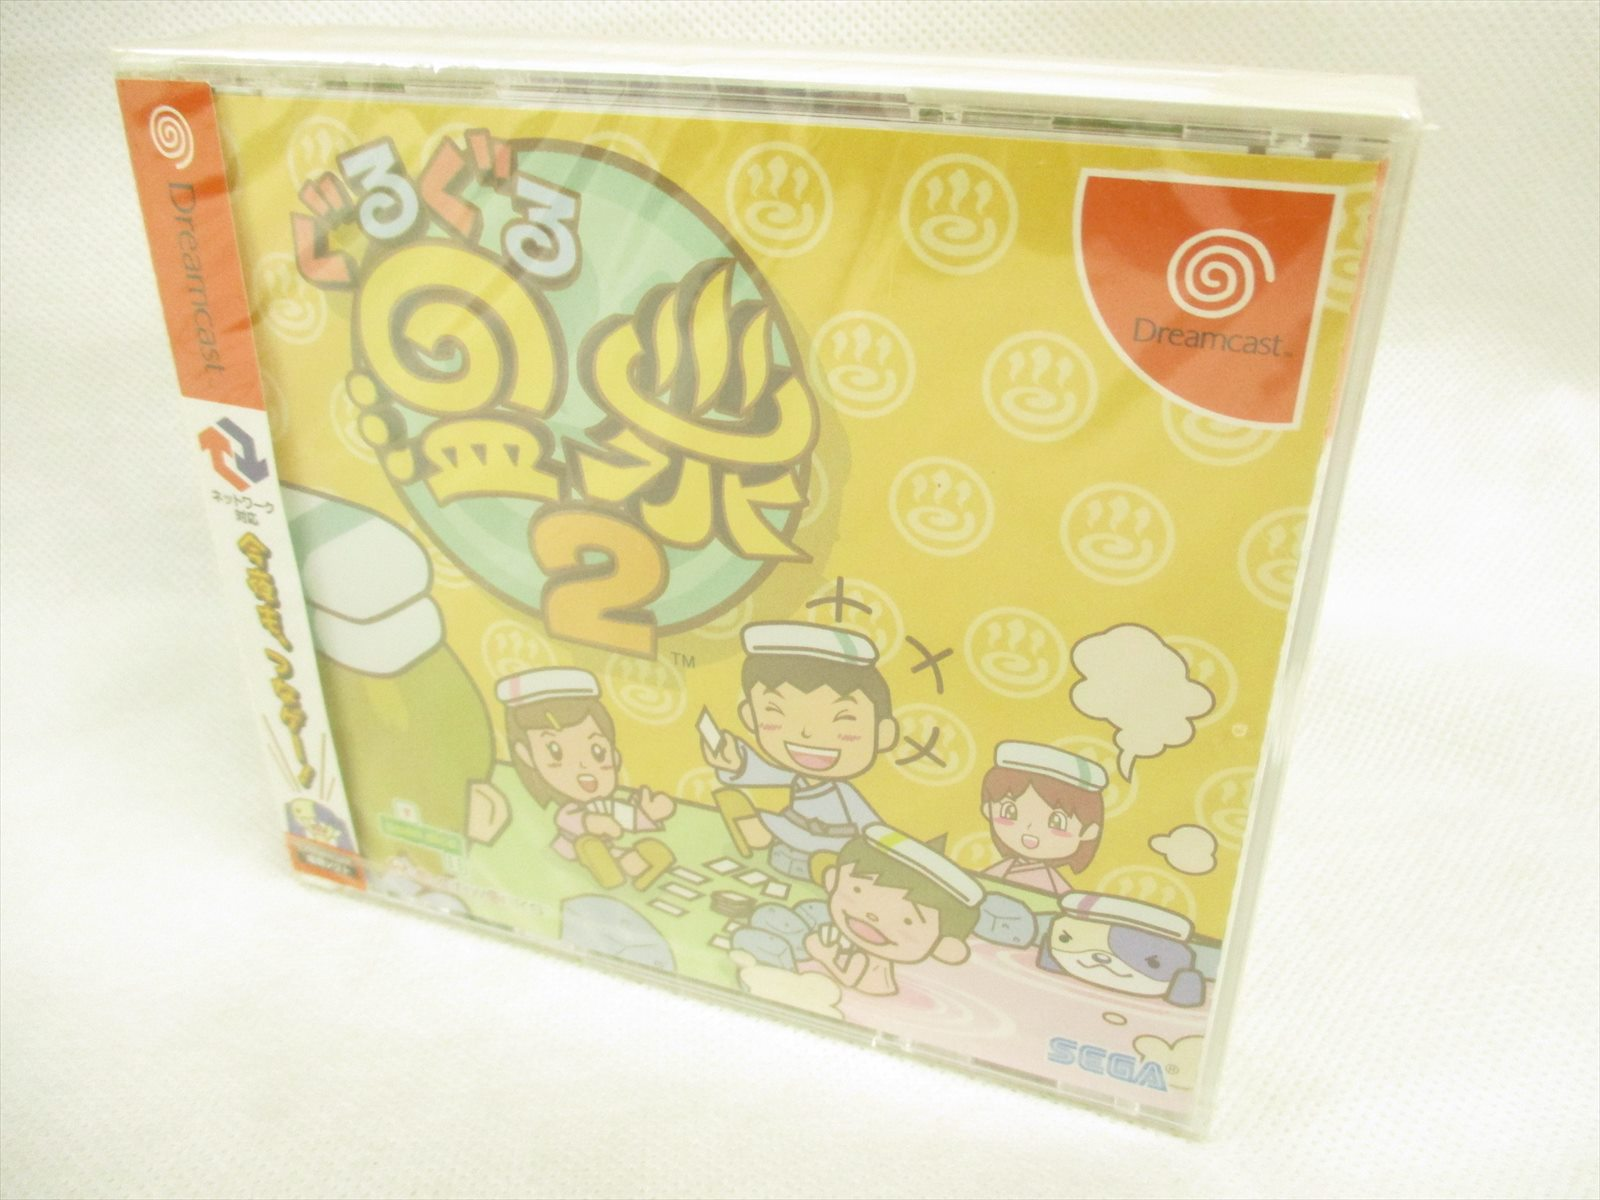 Details about Guruguru Onsen 2 guru Brand NEW Dreamcast Sega Import Japan  Game dc